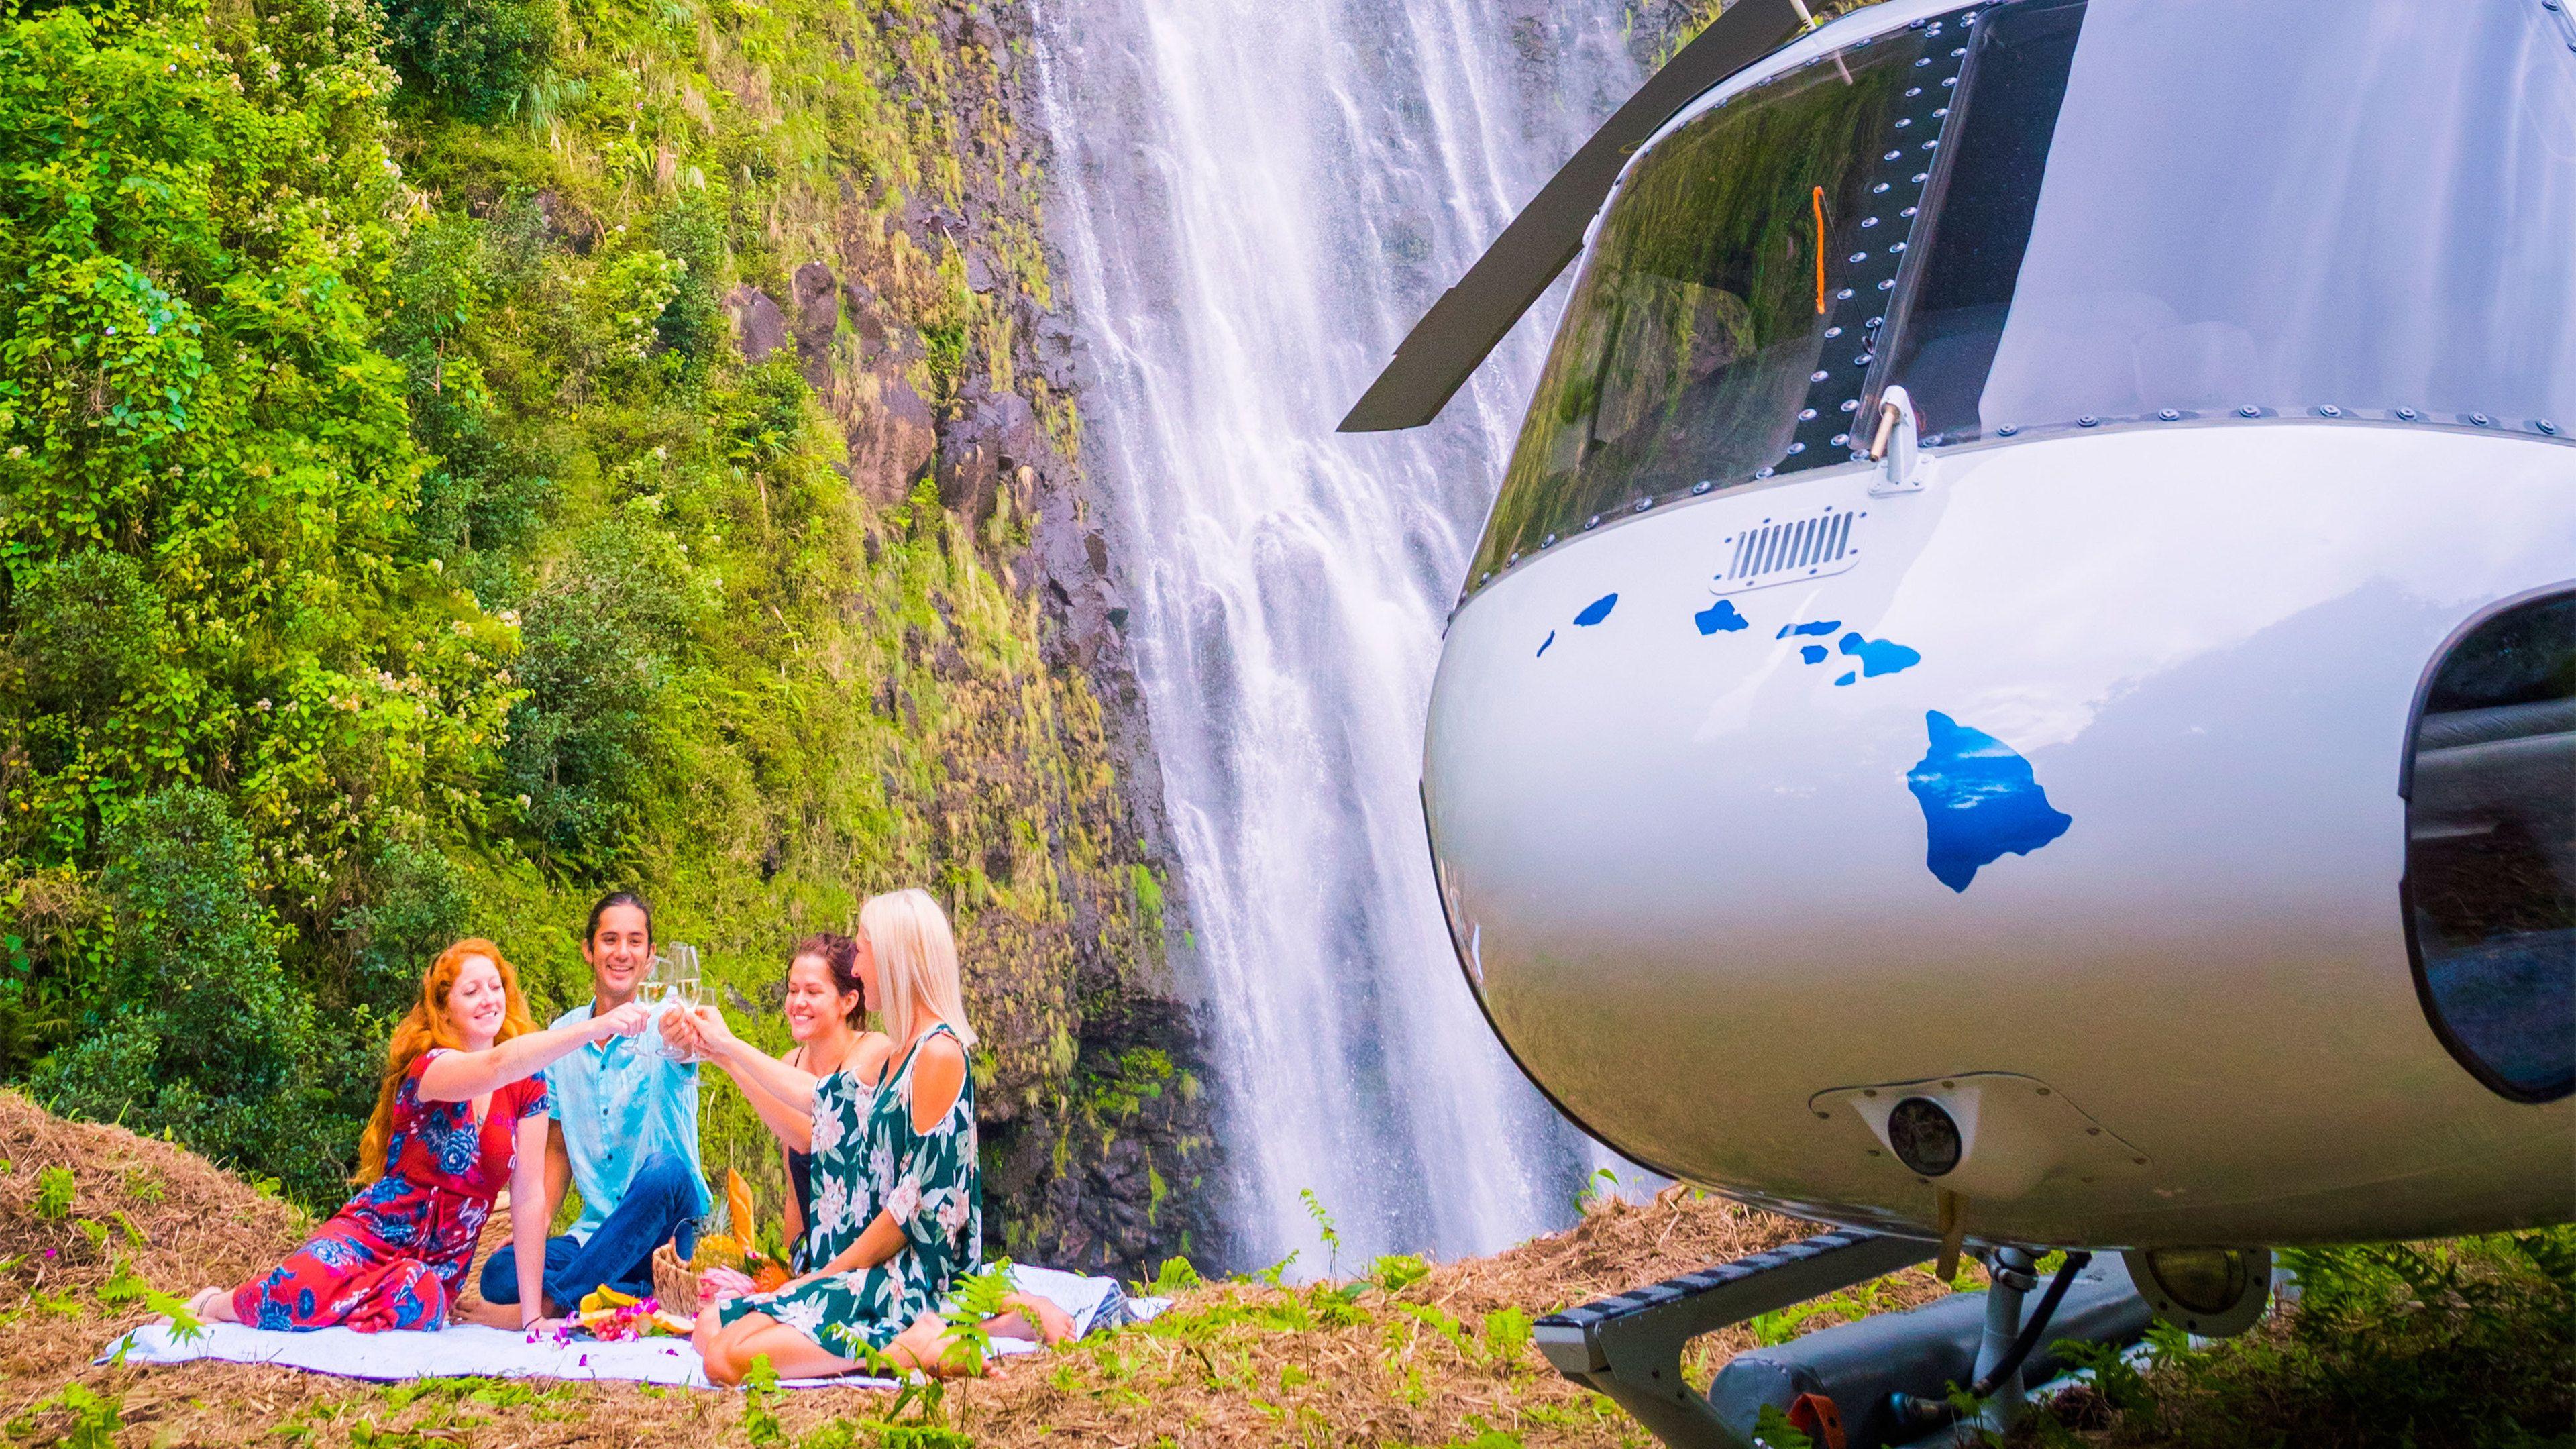 Kohala Helicopter Tour with Waterfall Landing